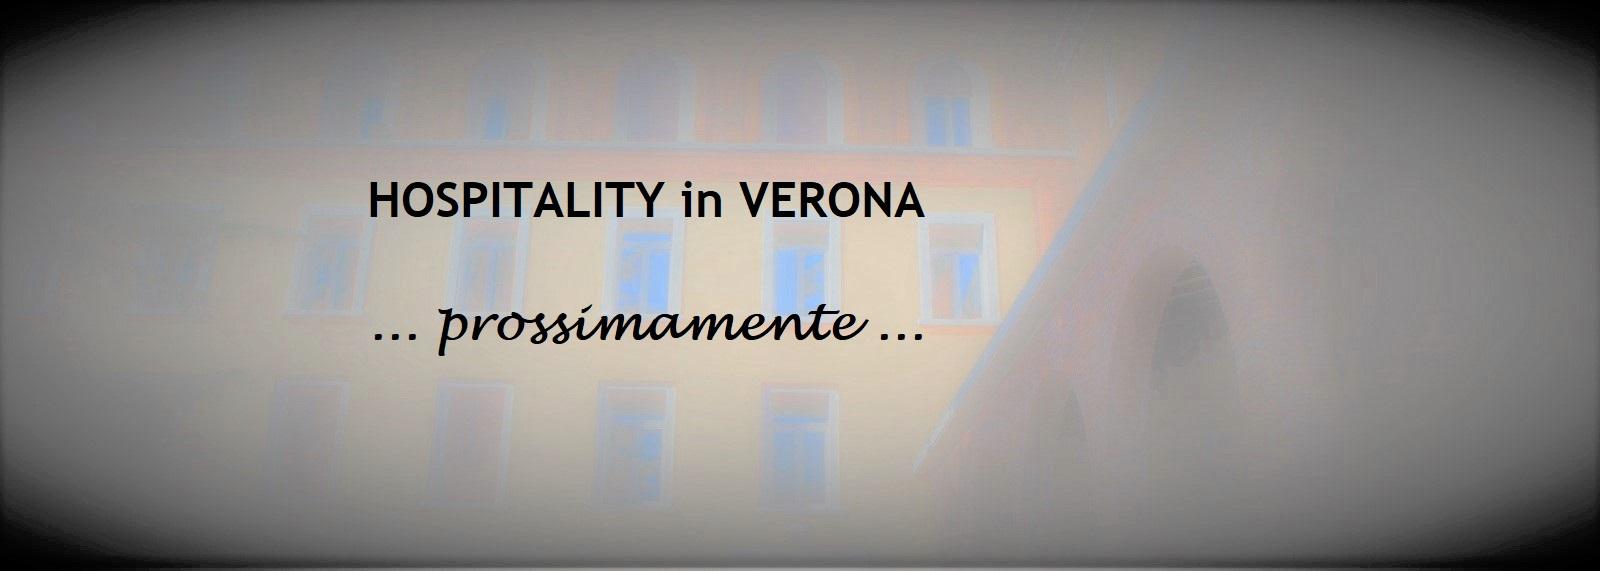 MONDO PICCOLO - Sacra Famiglia Hospitality VR